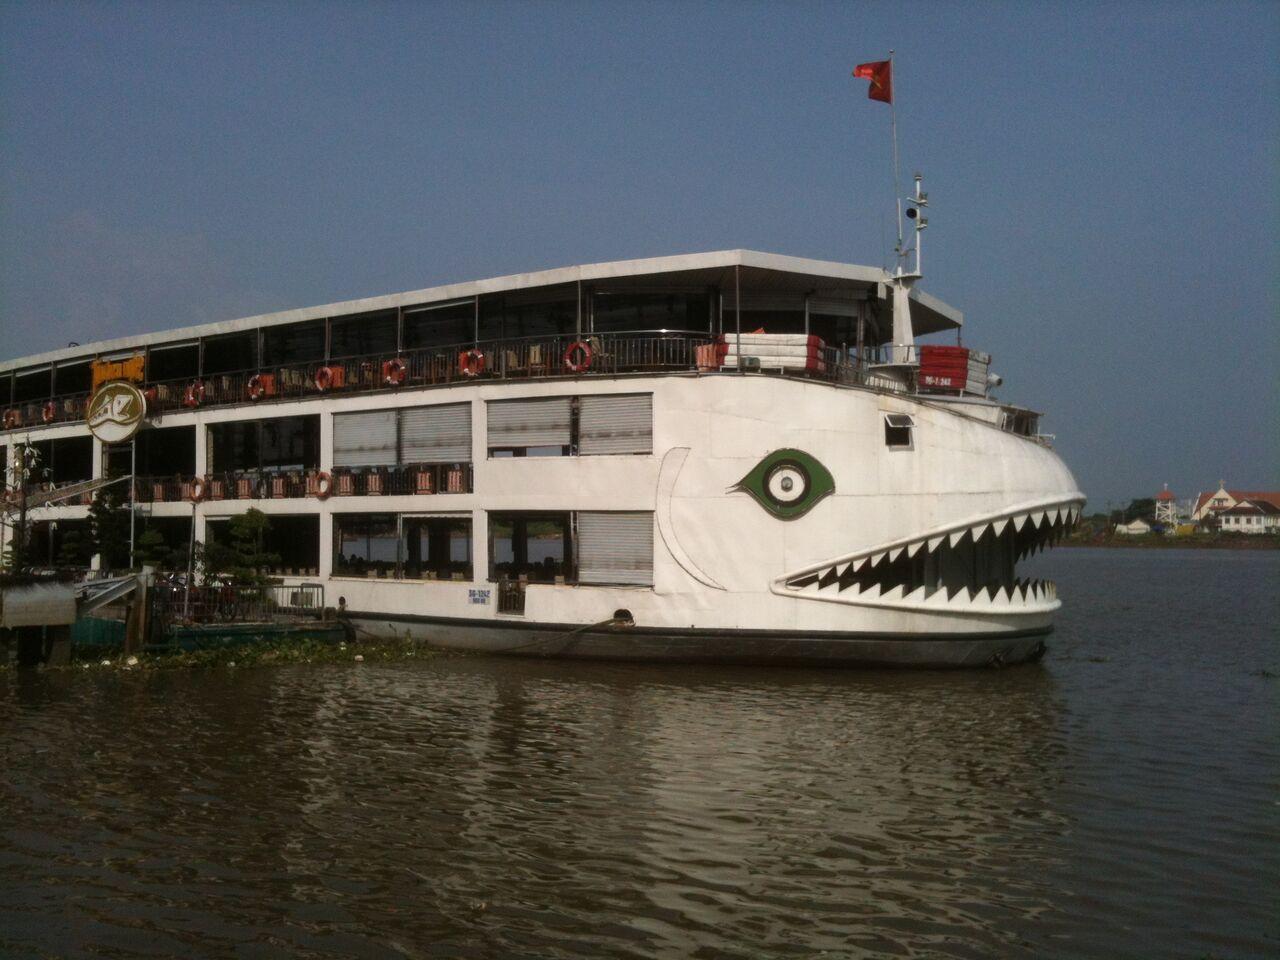 Dinner cruise on the delta